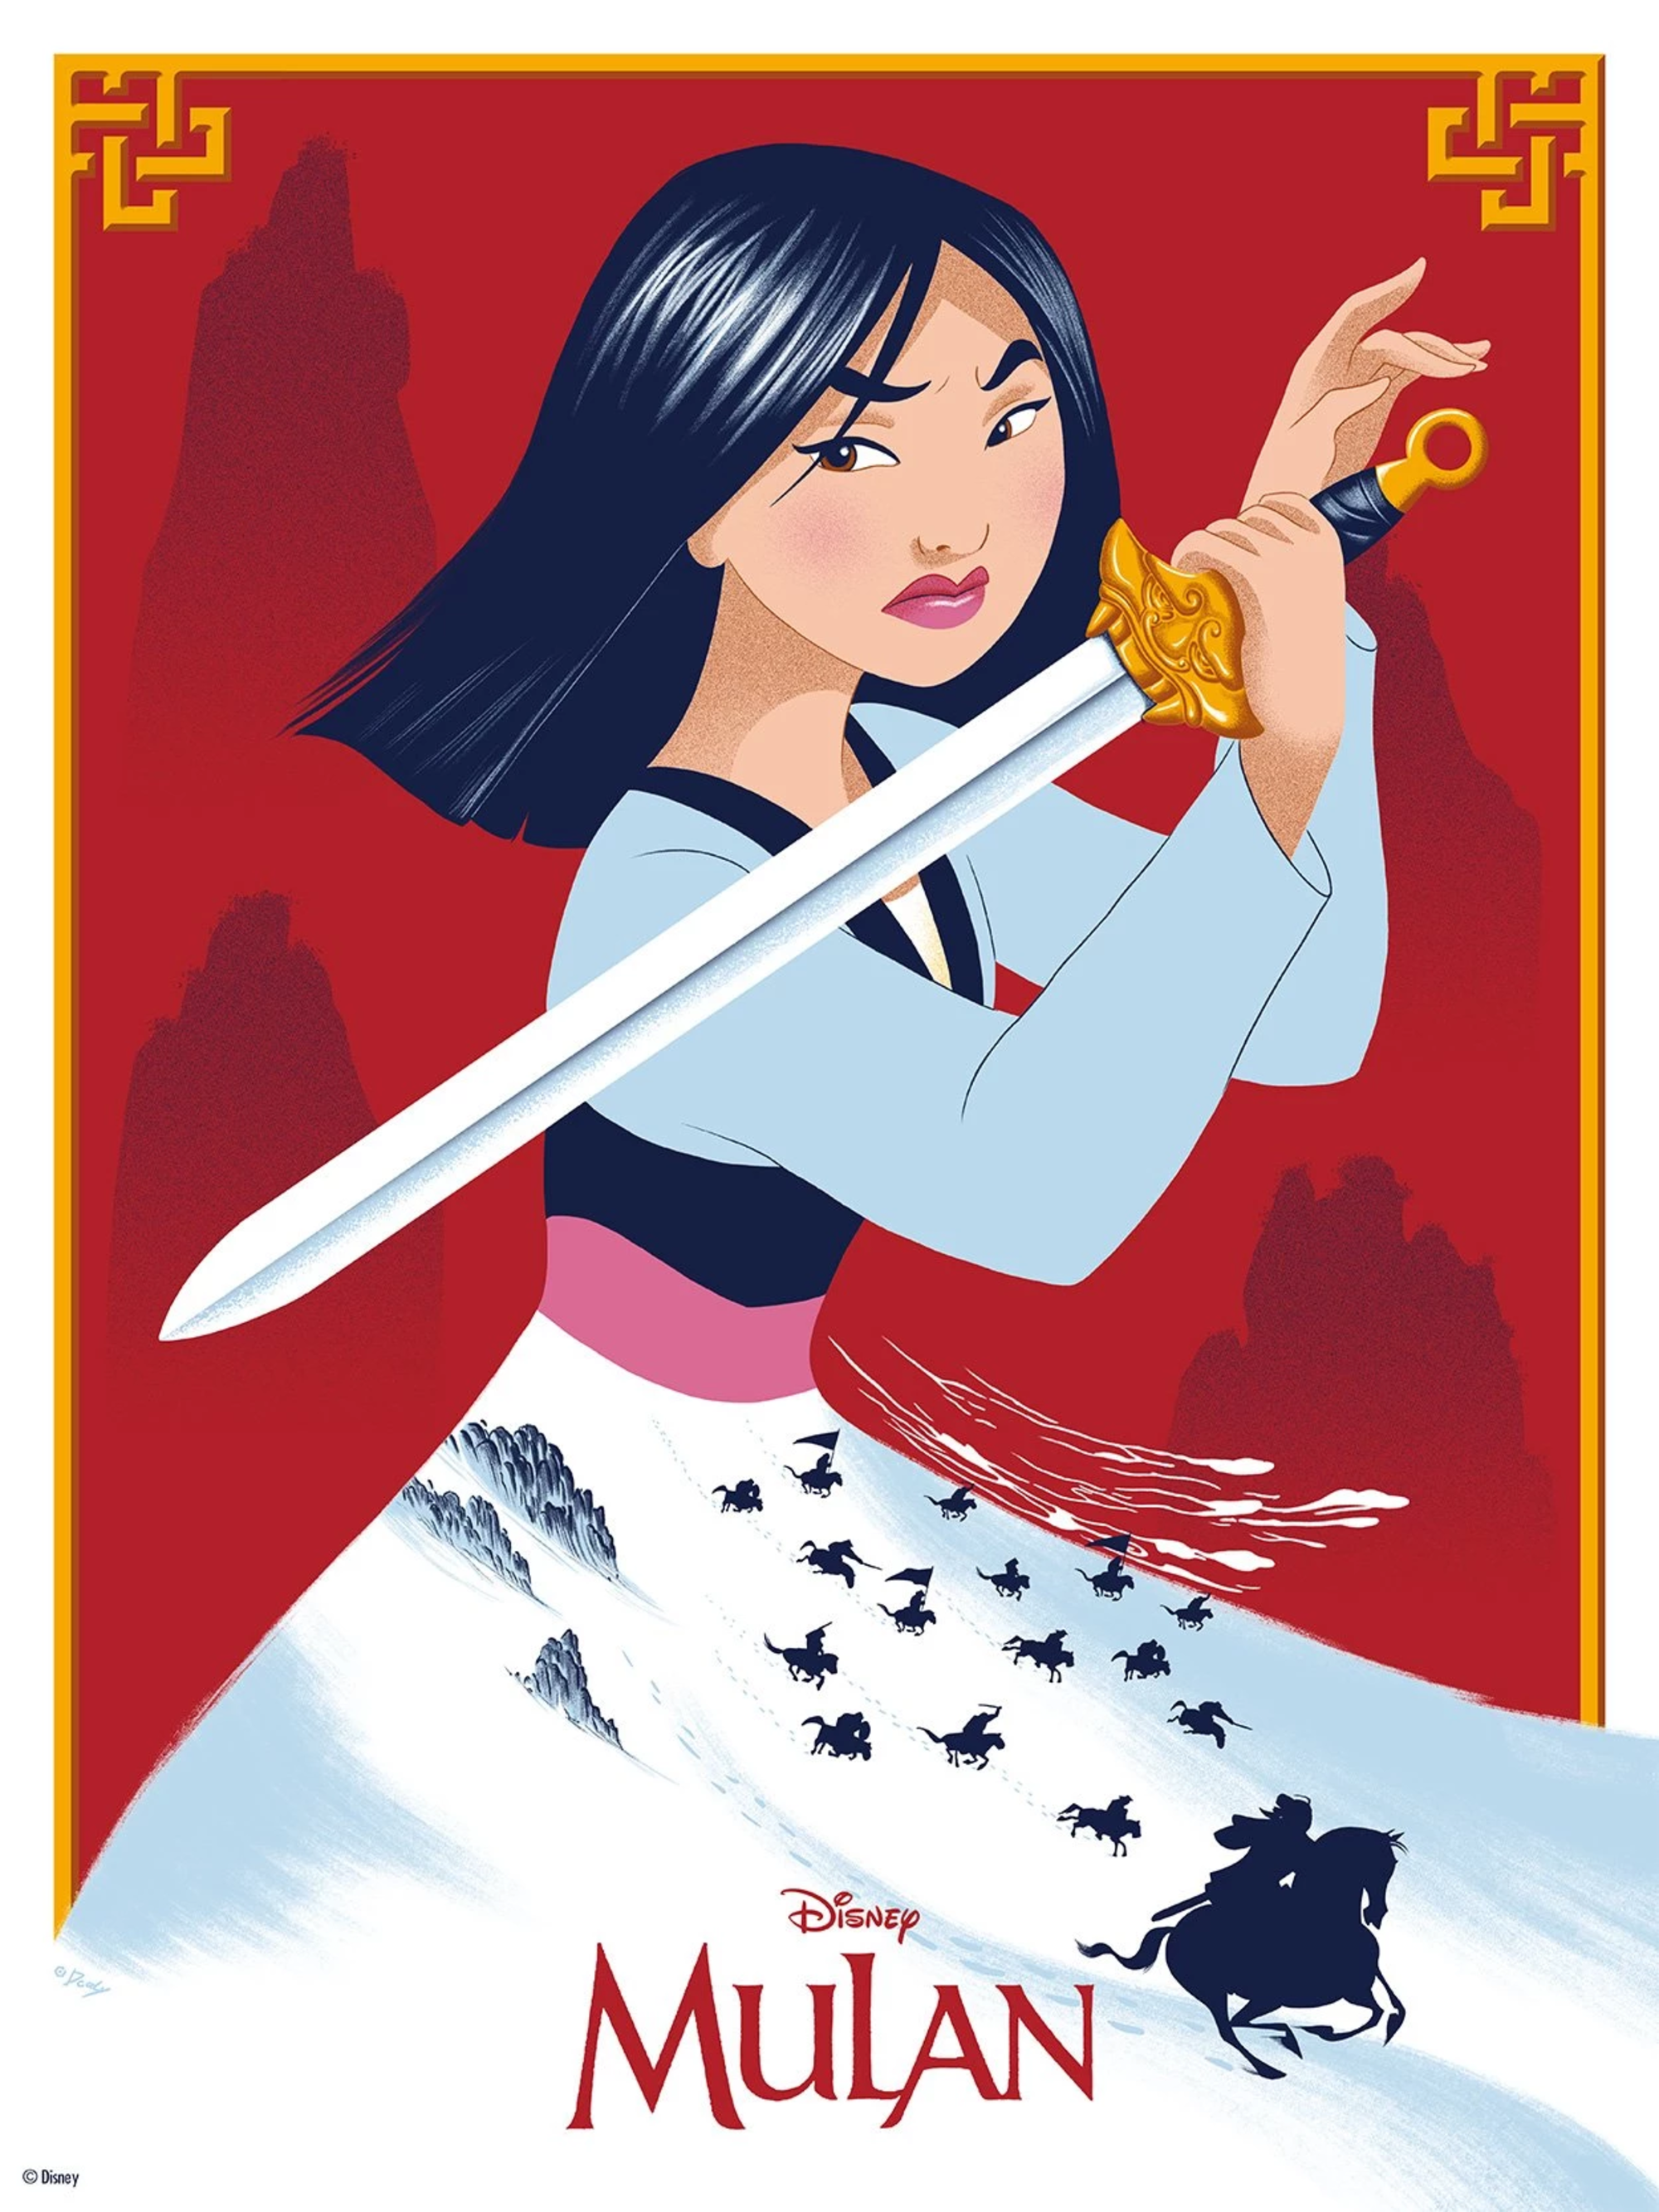 Mulan 1998 2000 2667 By Doaly Movie Prints Disney Art Disney Posters